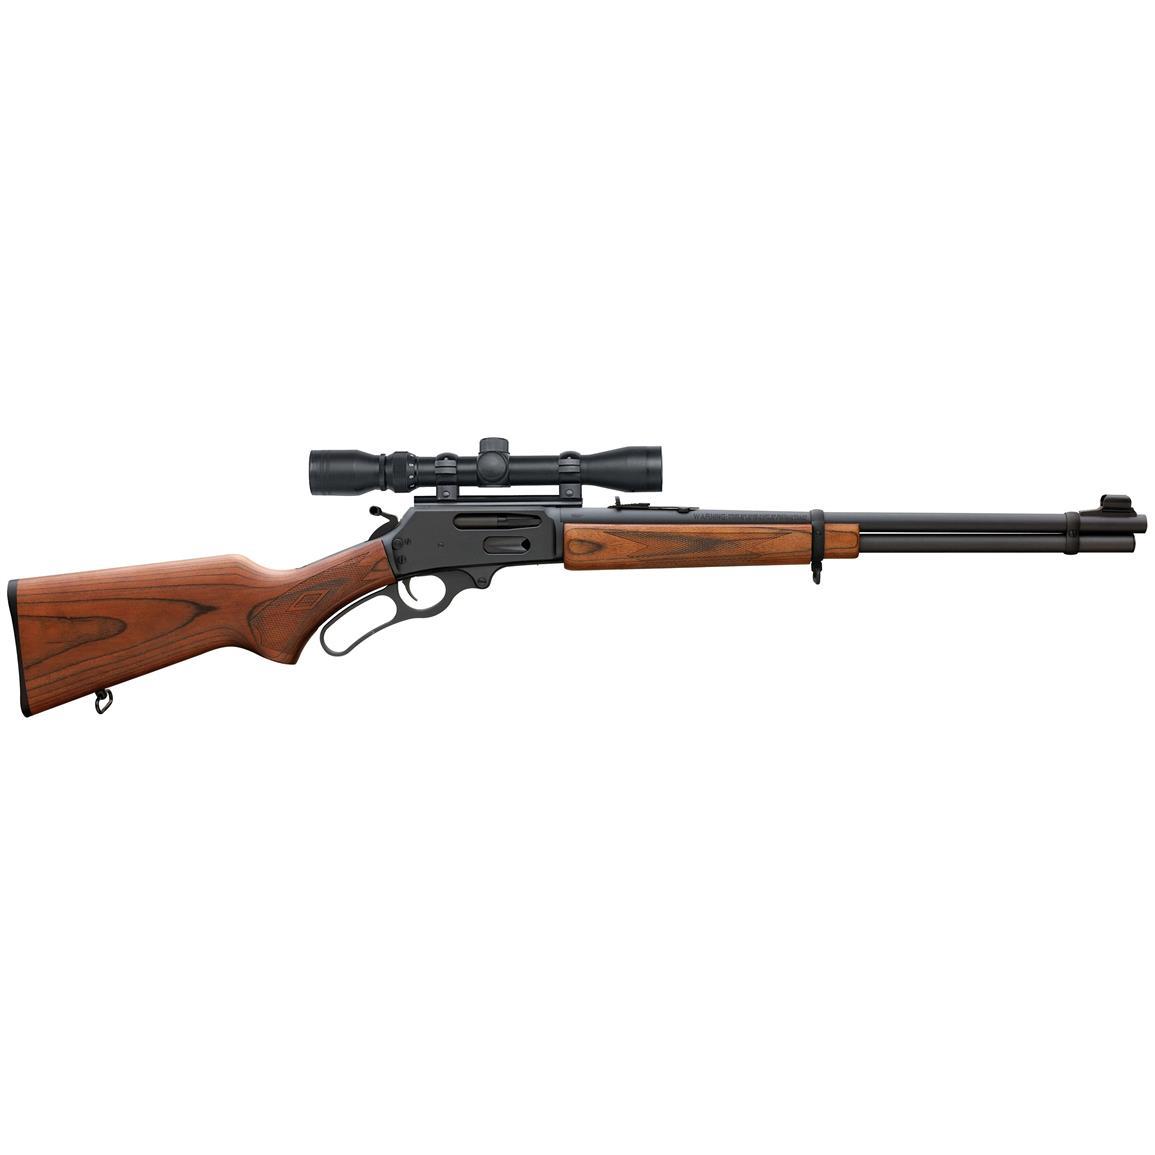 1155x1155 > Marlin Rifle Wallpapers